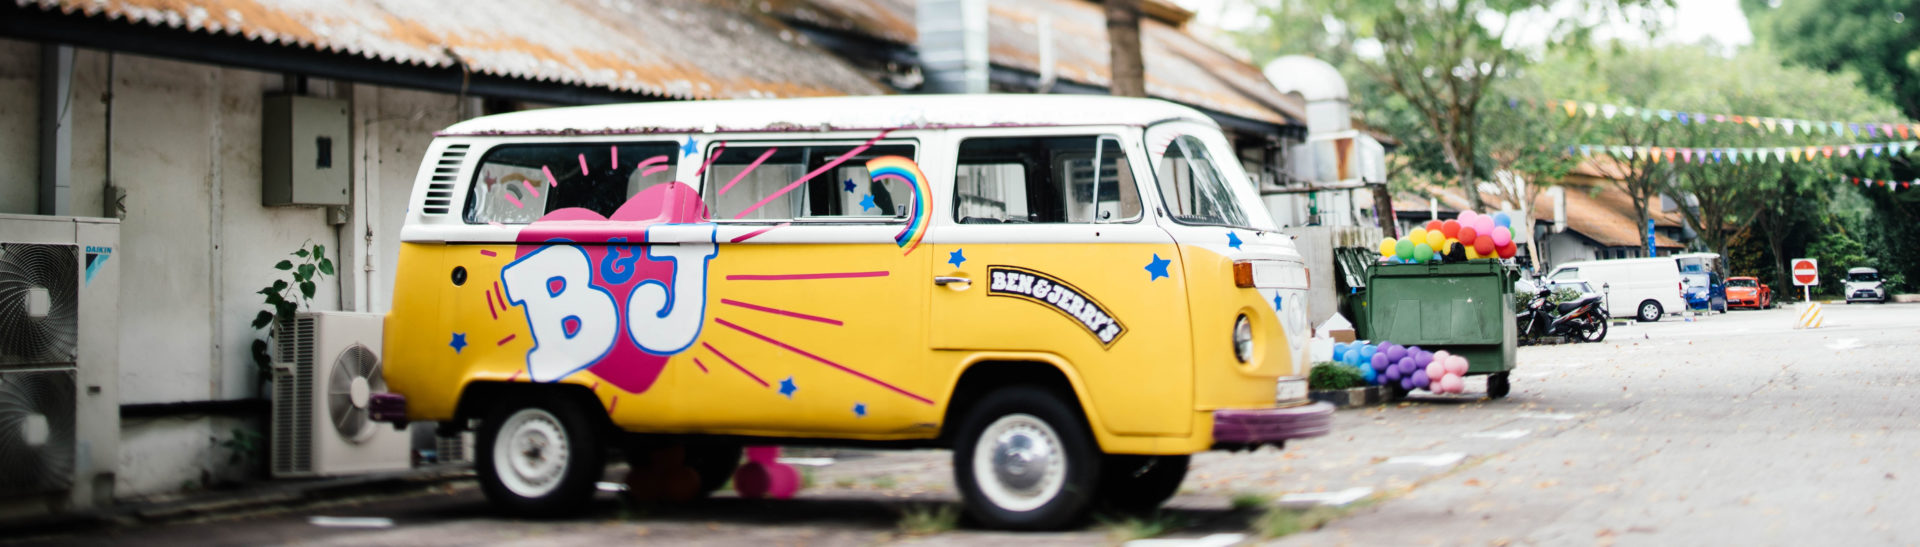 In vier stappen groeien als Unilever's snelst groeiende merken